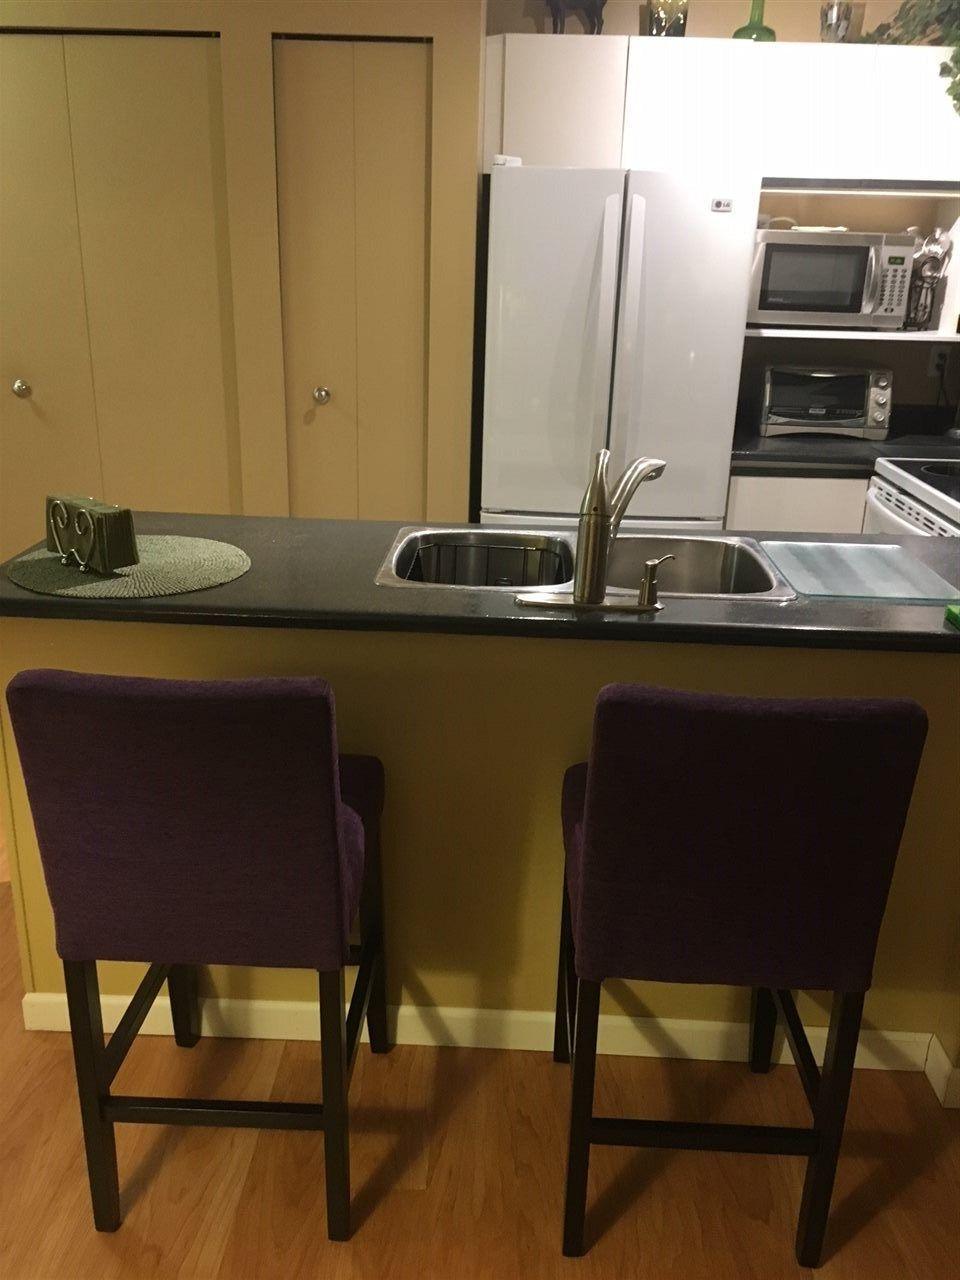 "Photo 7: Photos: 202 20561 113 Avenue in Maple Ridge: Southwest Maple Ridge Condo for sale in ""WARESLY PLACE"" : MLS®# R2229182"